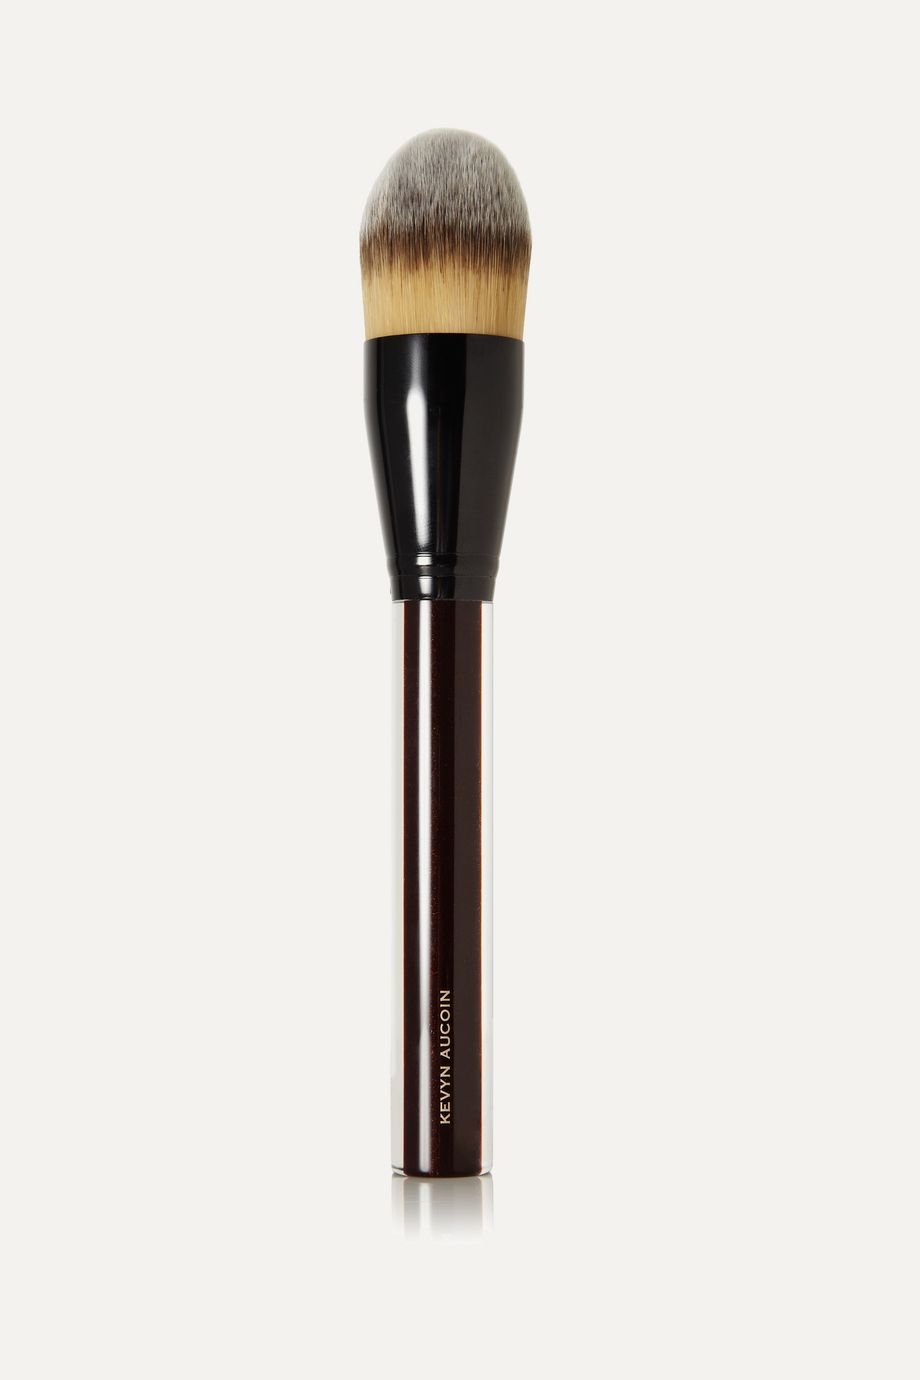 Kevyn Aucoin Pinceau fond de teint The Foundation Brush